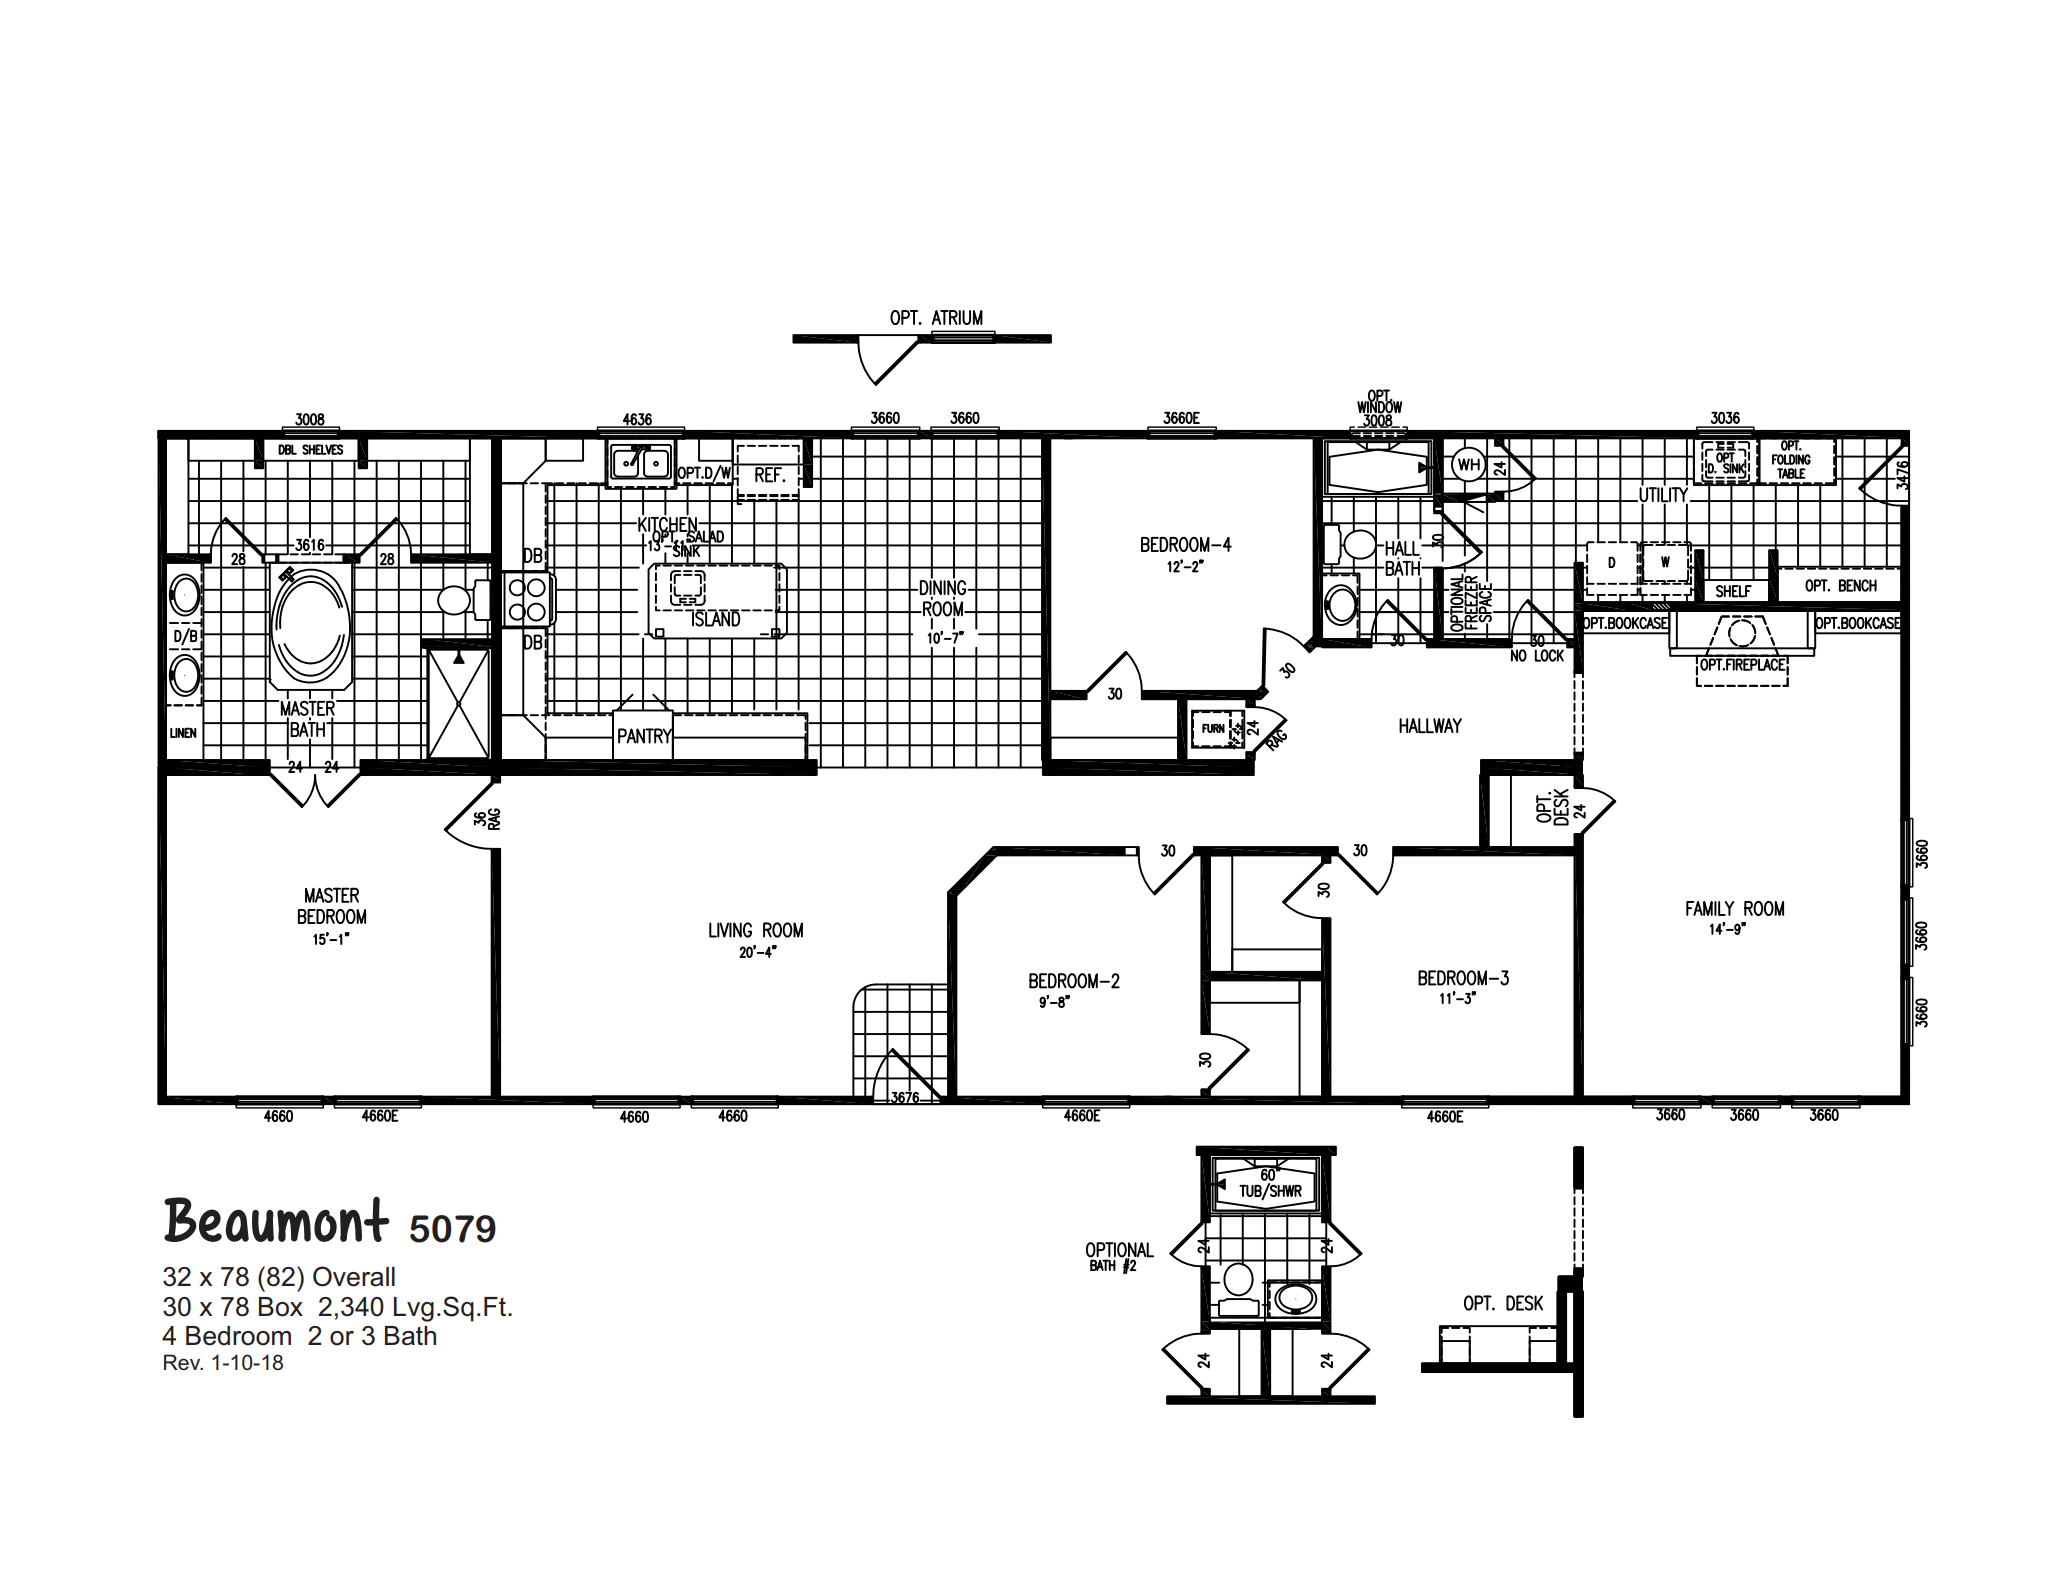 Beaumont 5079 Oak Creek Homes Modular Home Plans Modular Home Floor Plans Basement House Plans